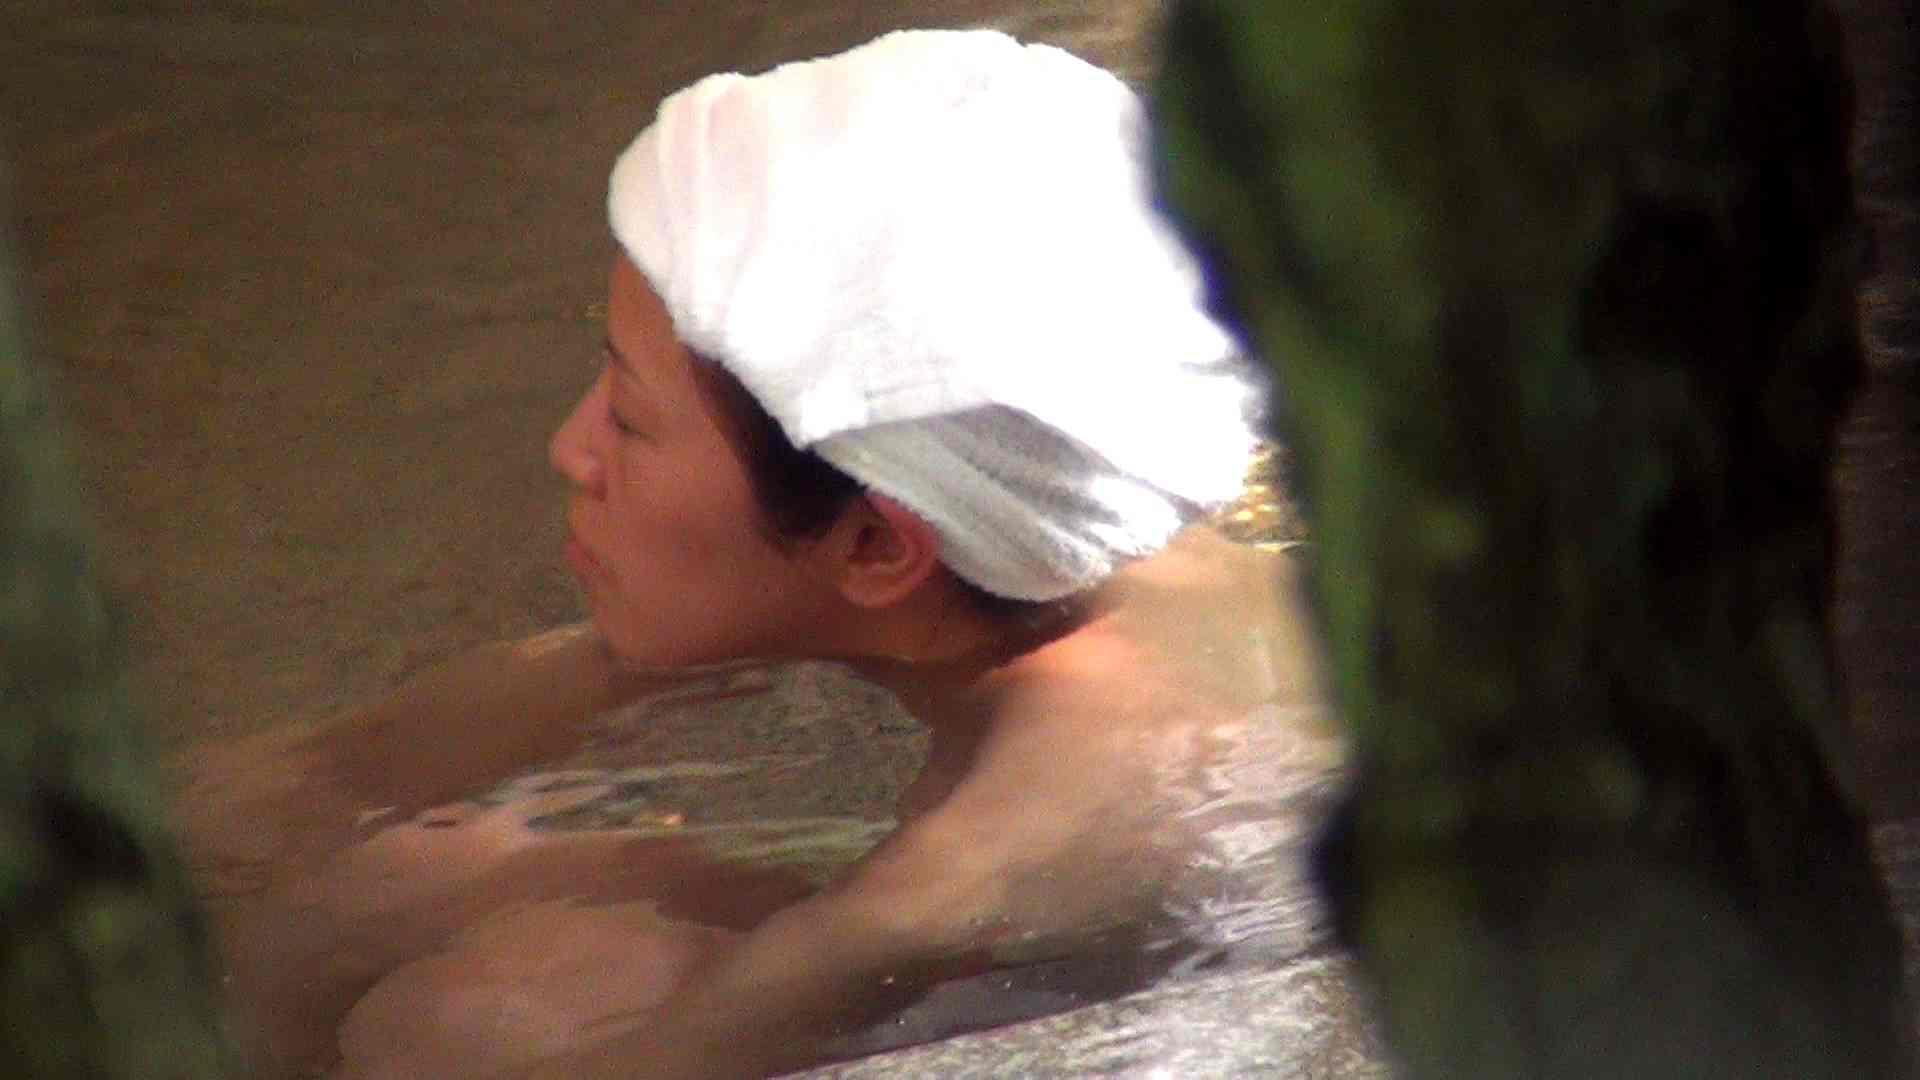 Aquaな露天風呂Vol.281 露天風呂 すけべAV動画紹介 57連発 44